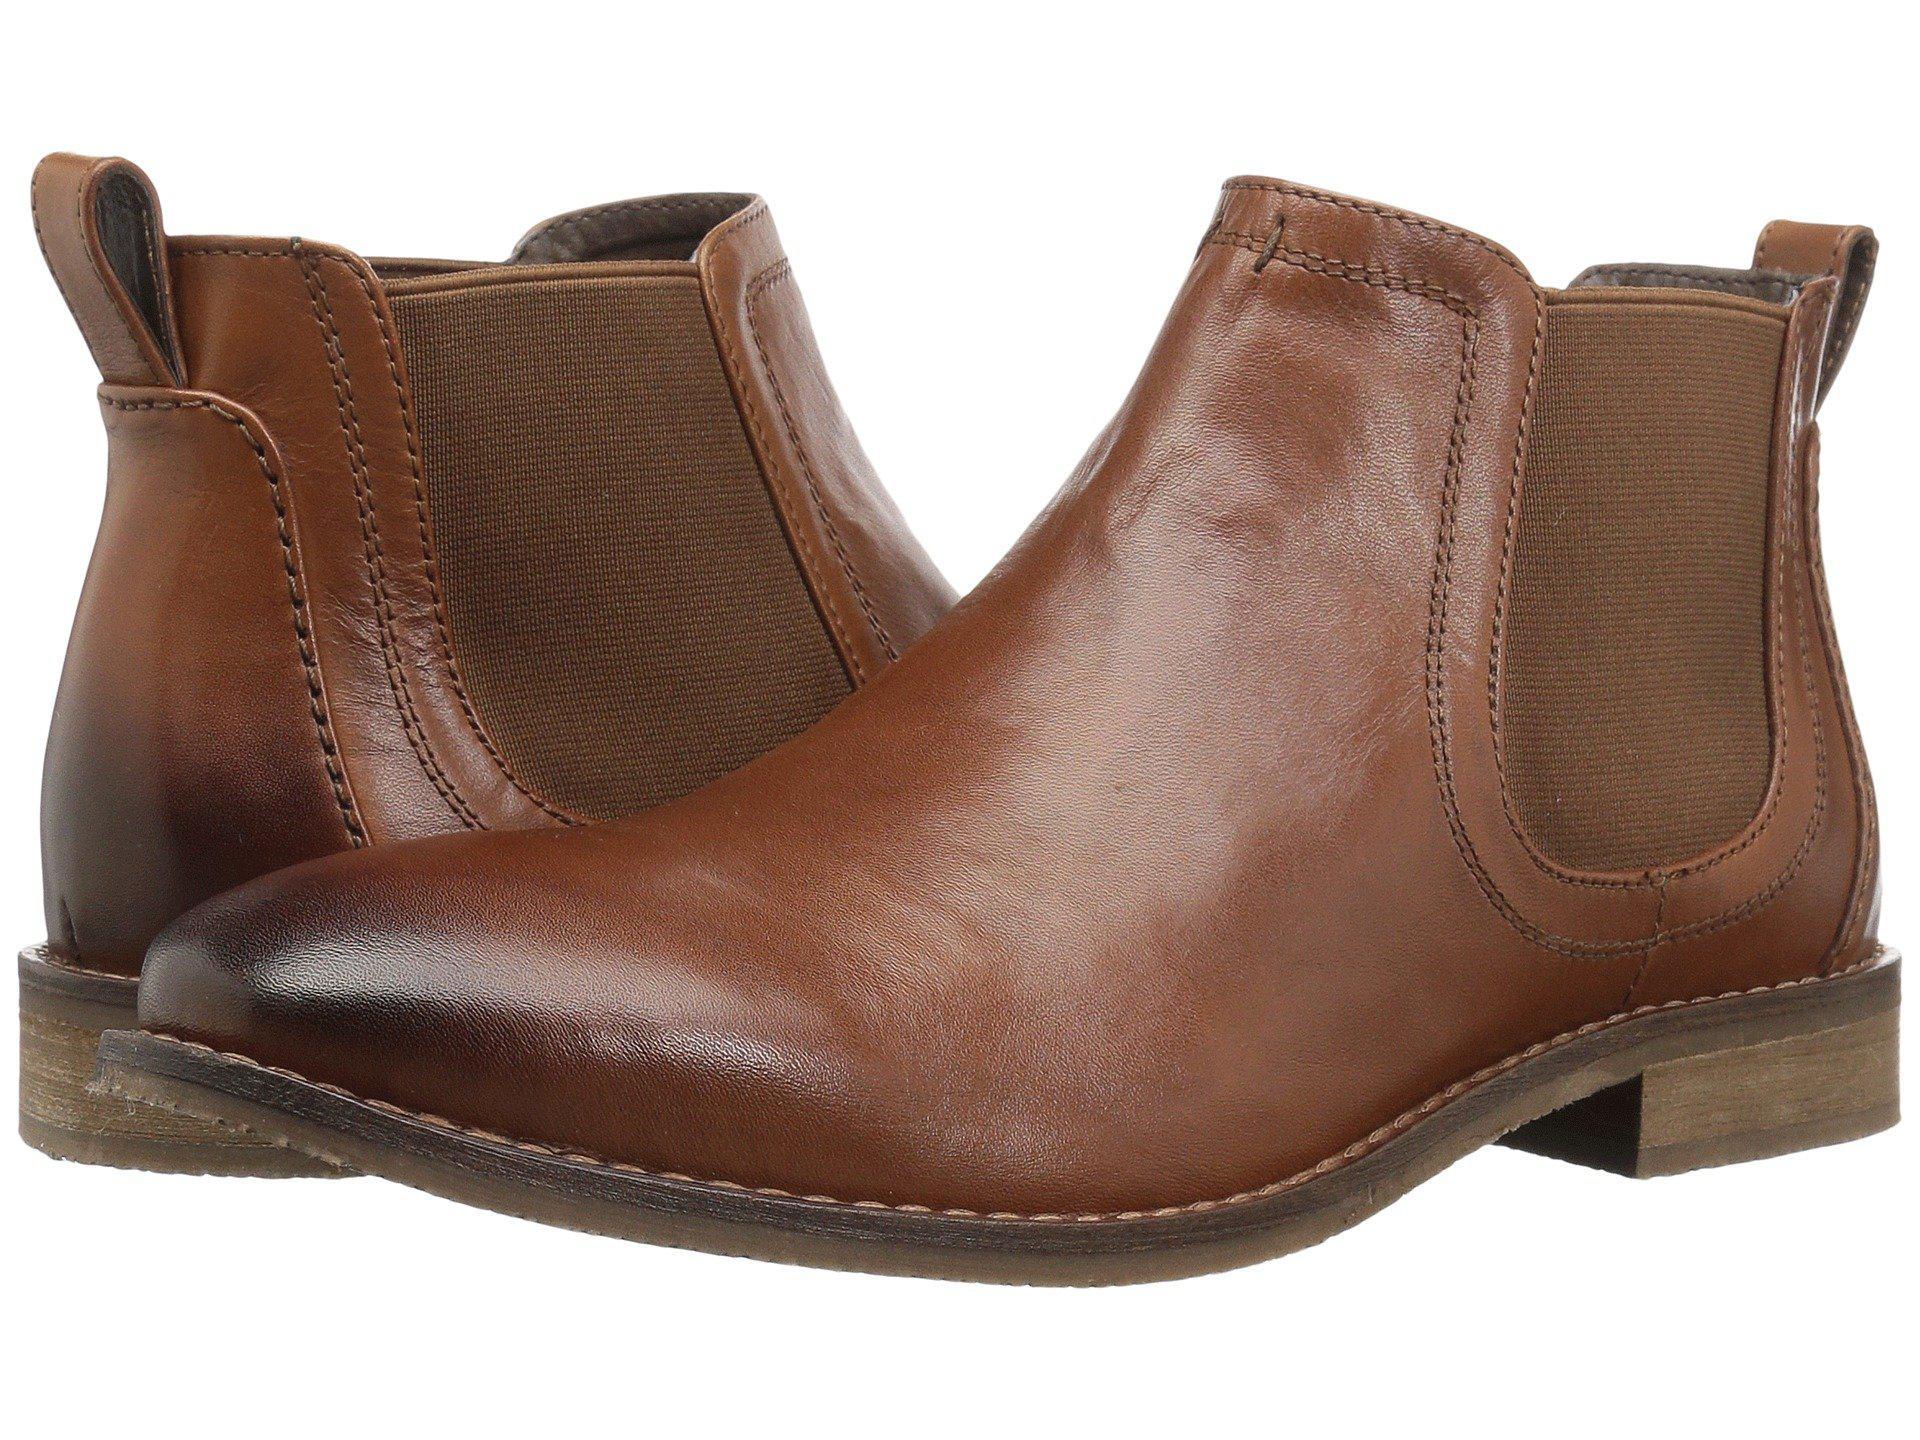 ec837c679d84b Lyst - Nunn Bush Hartley Double Gore Boot in Brown for Men - Save 12%